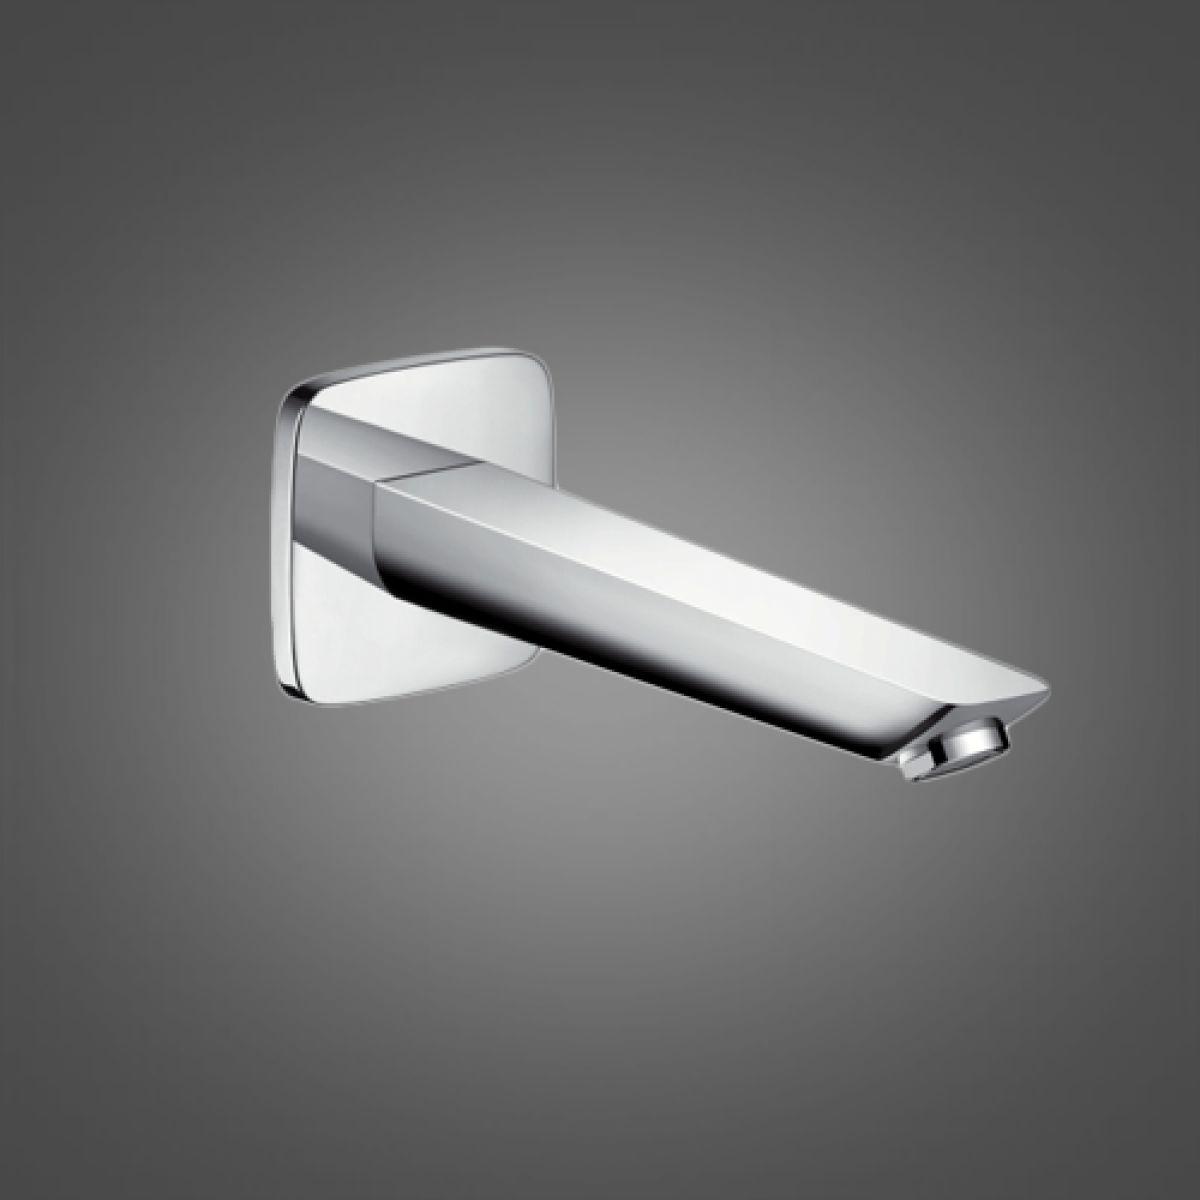 hansgrohe logis bath spout uk bathrooms. Black Bedroom Furniture Sets. Home Design Ideas